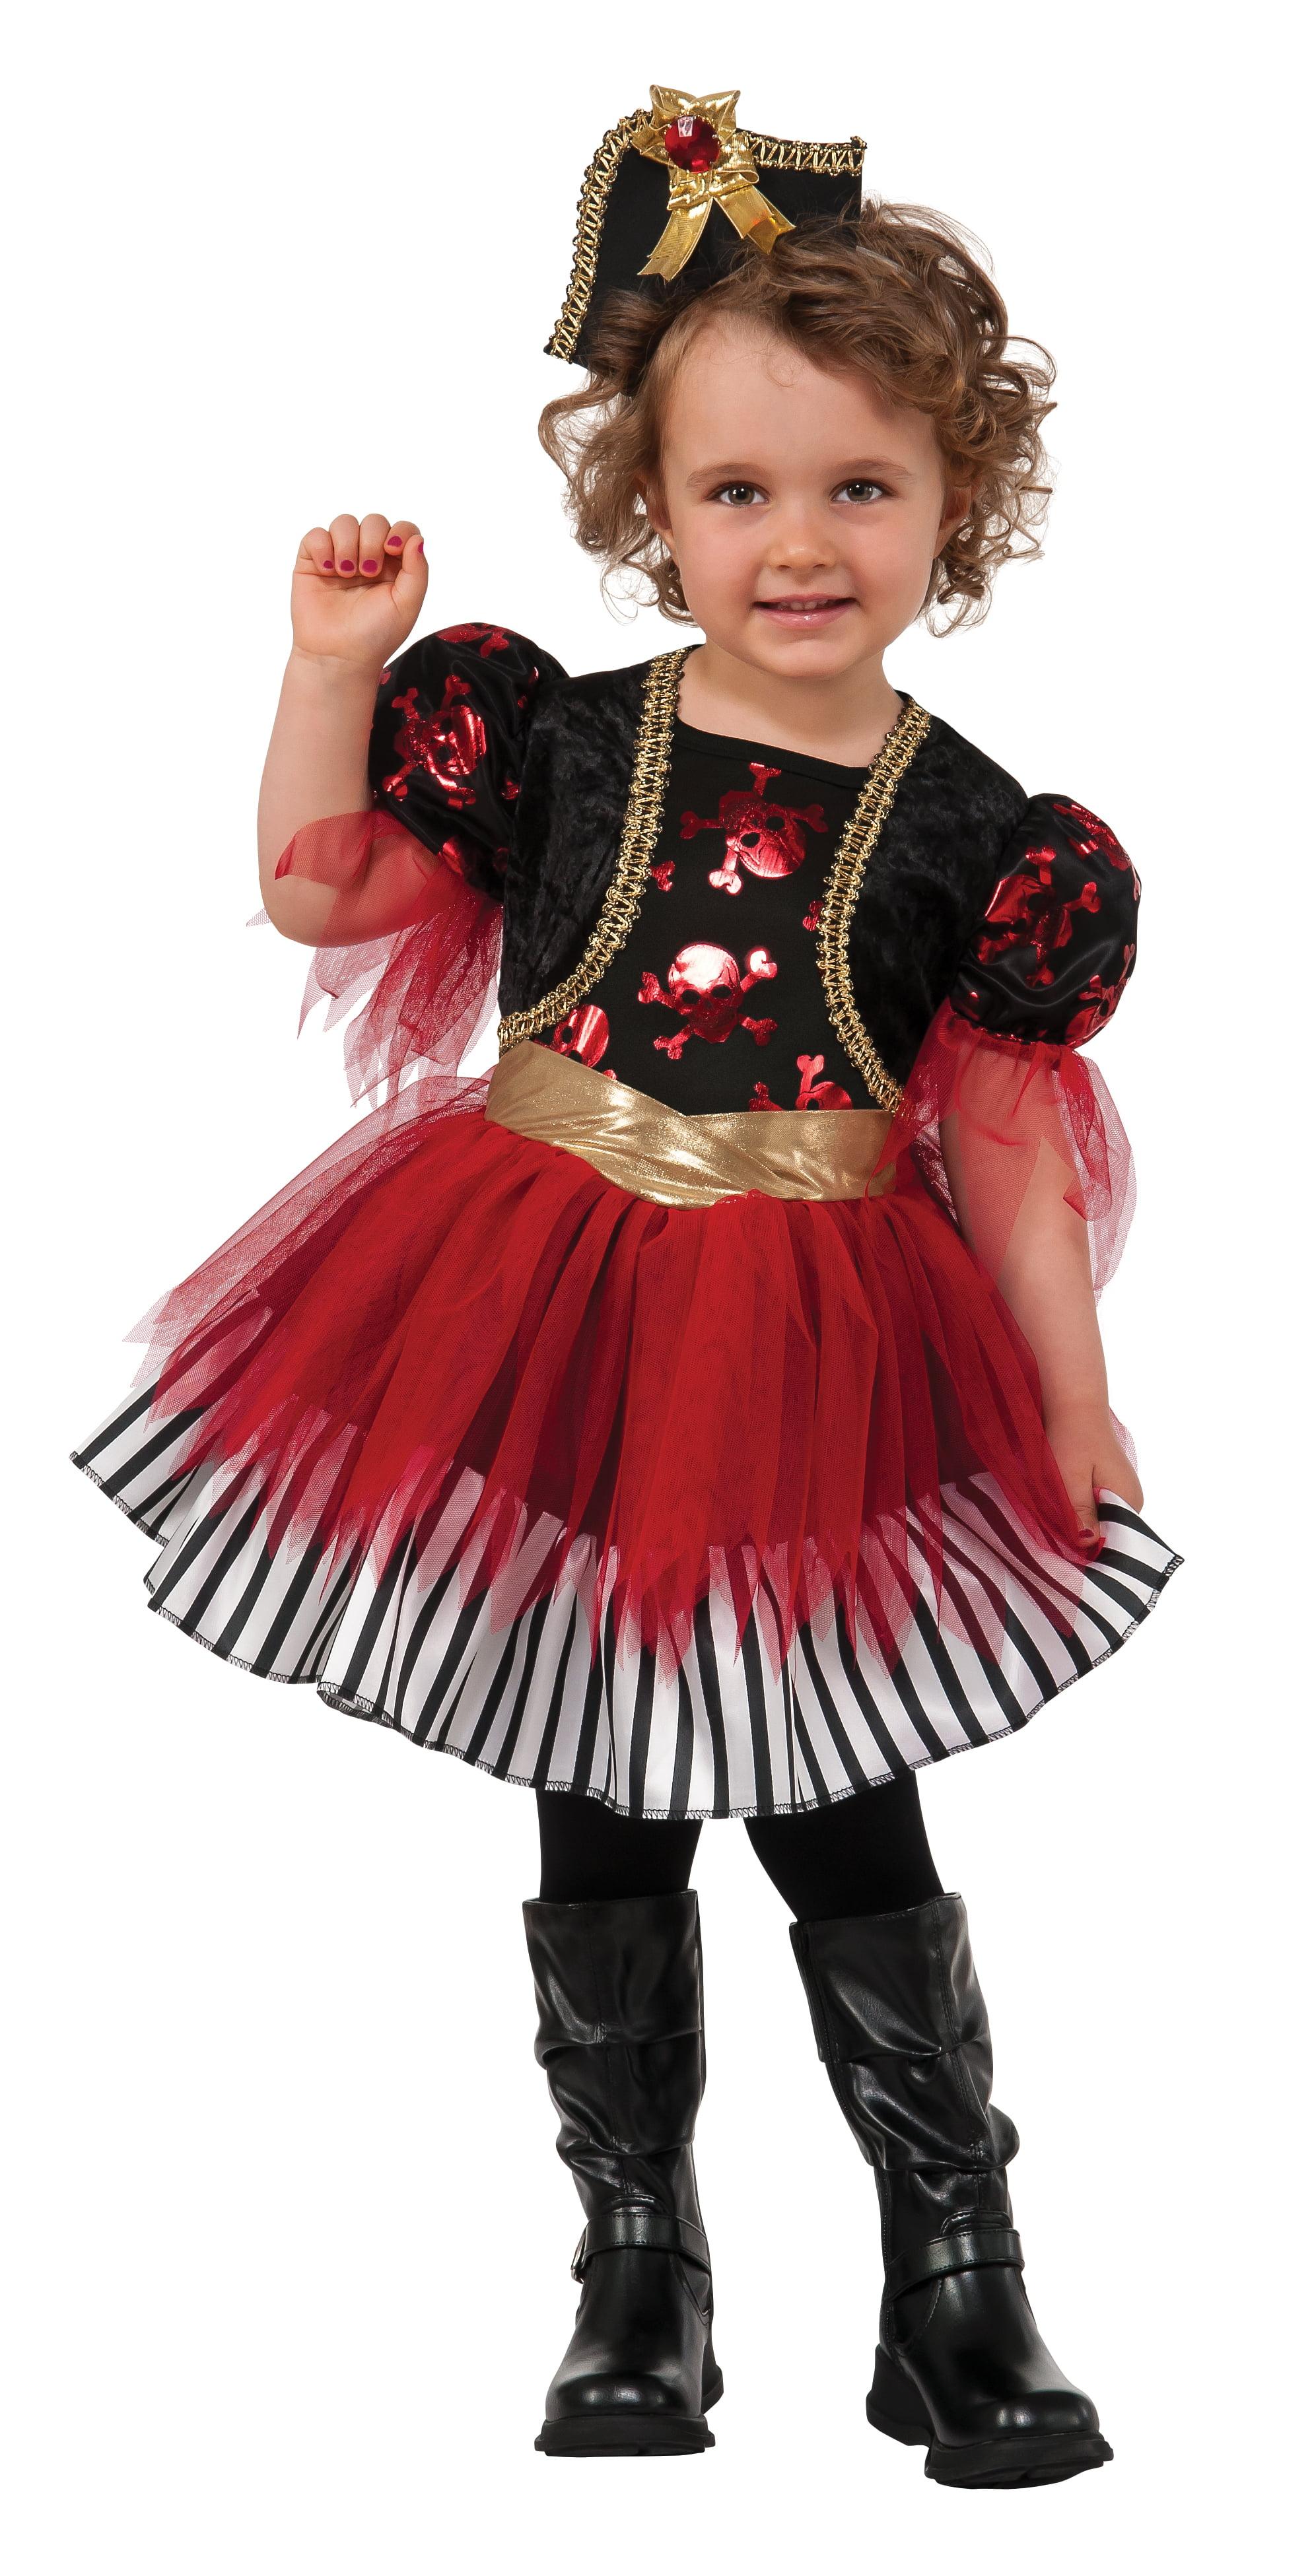 Toddler Girl Treasure Island Pirate Costume by Rubies 610846, Medium by Rubies